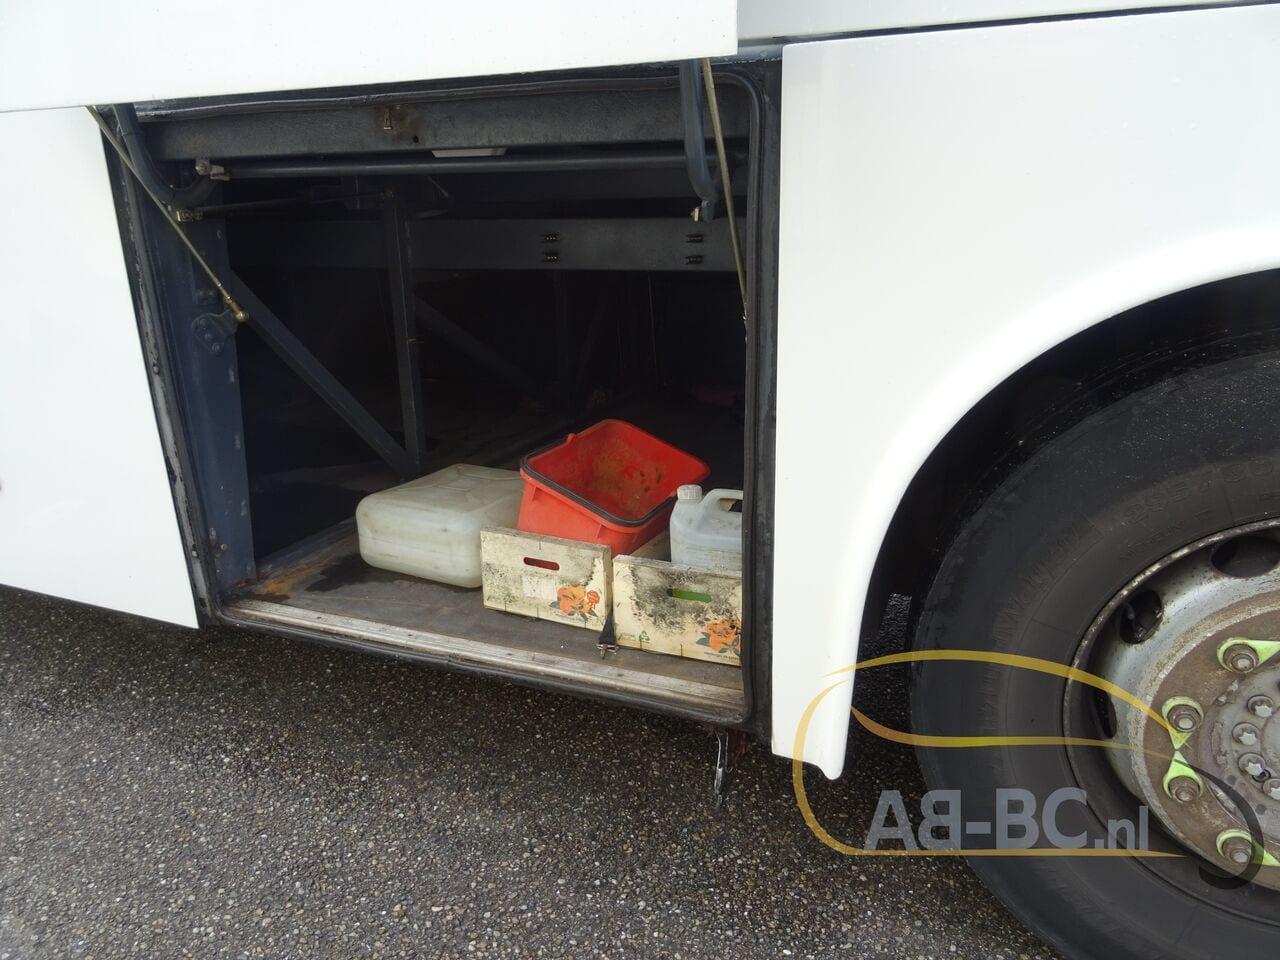 coach-busTEMSA-Safari-RD-65-Seats---1620311805158247726_big_8487cd2525e499e2265034f916bca347--21050617272795316700